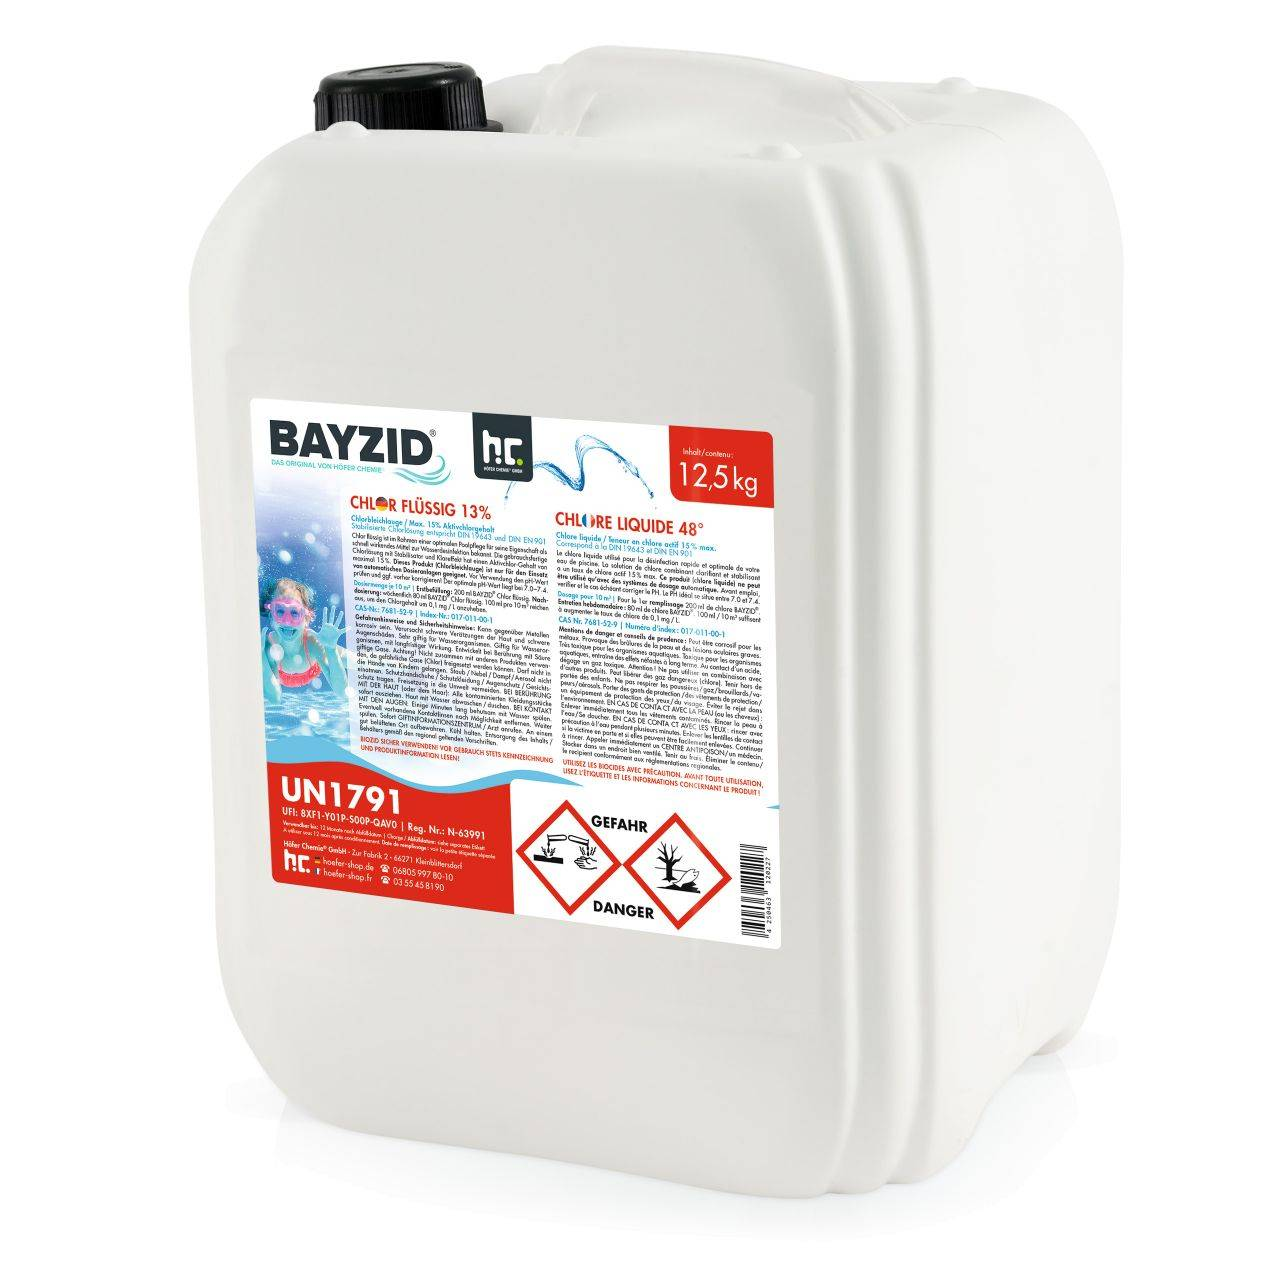 BAYZID 2,5 kg Bayzid® Chlore liquide 48° (1 x 12.5 kg)